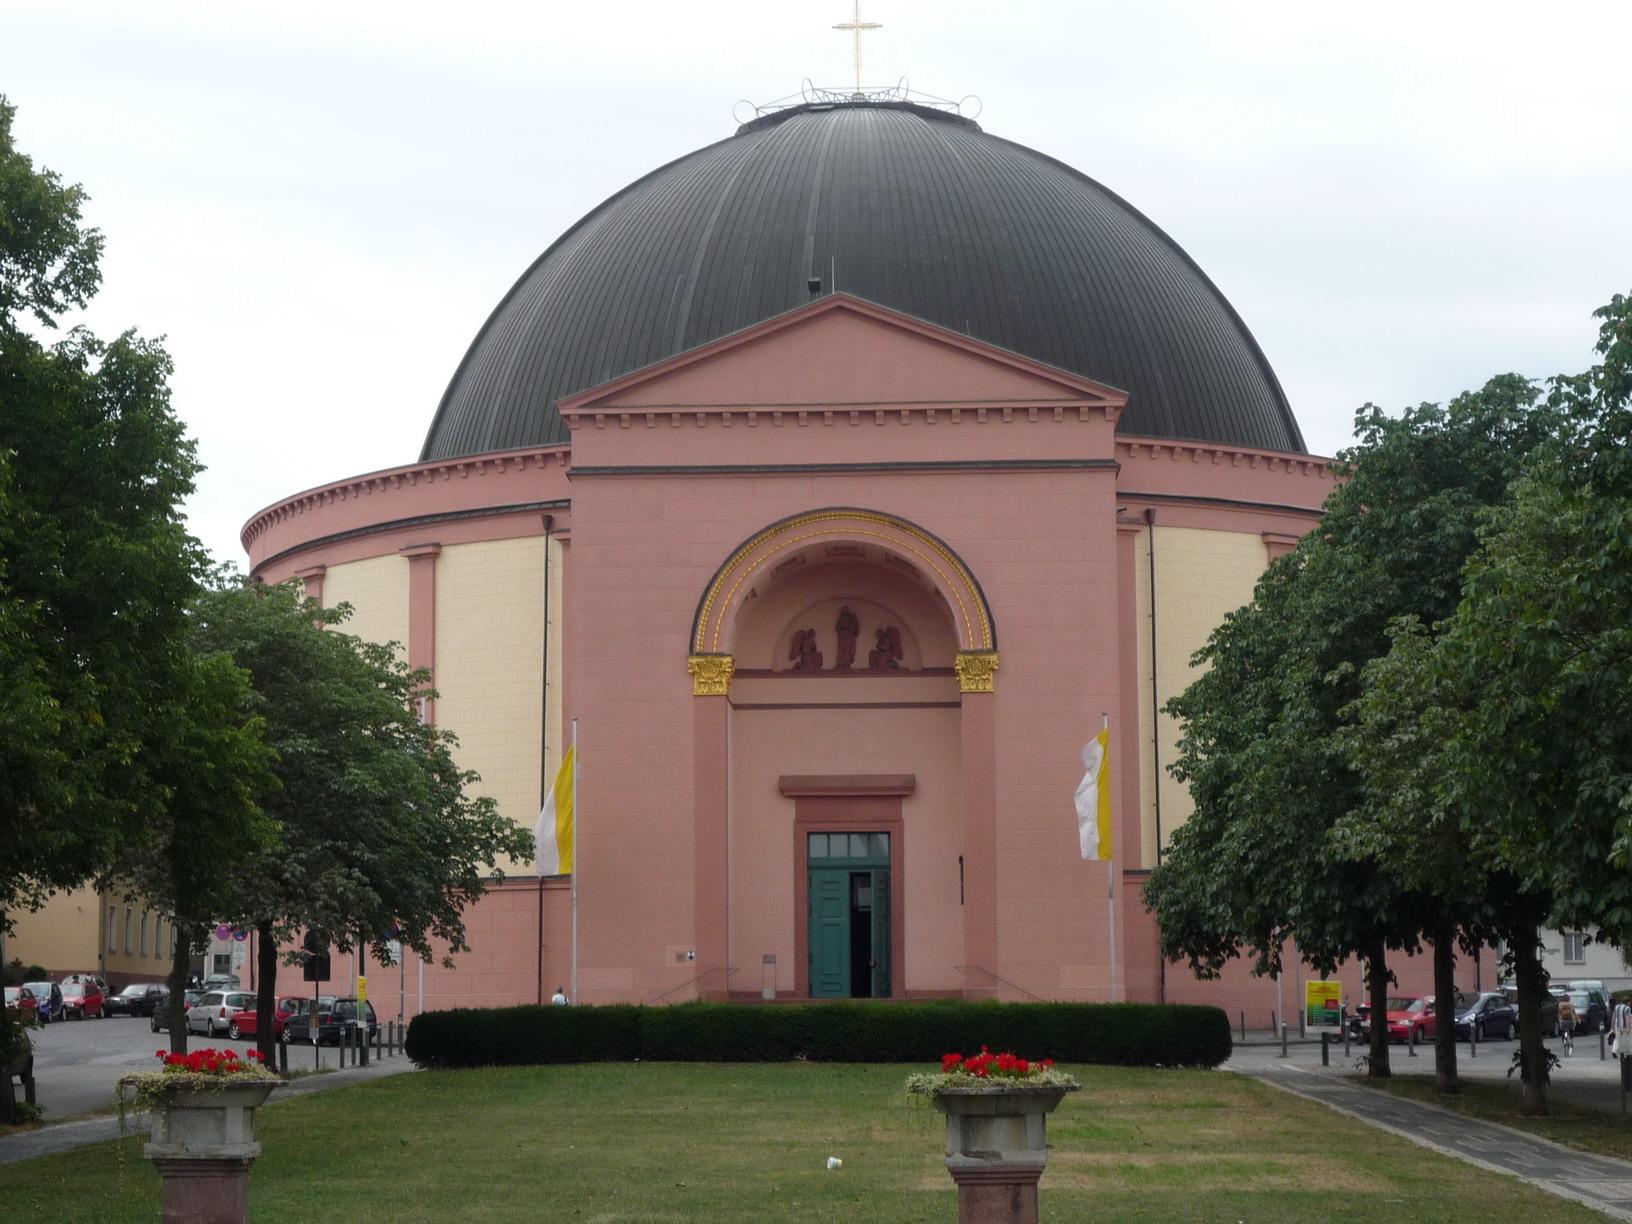 St Ludwig Darmstadt : file st ludwig darmstadt 548 wikimedia commons ~ Watch28wear.com Haus und Dekorationen